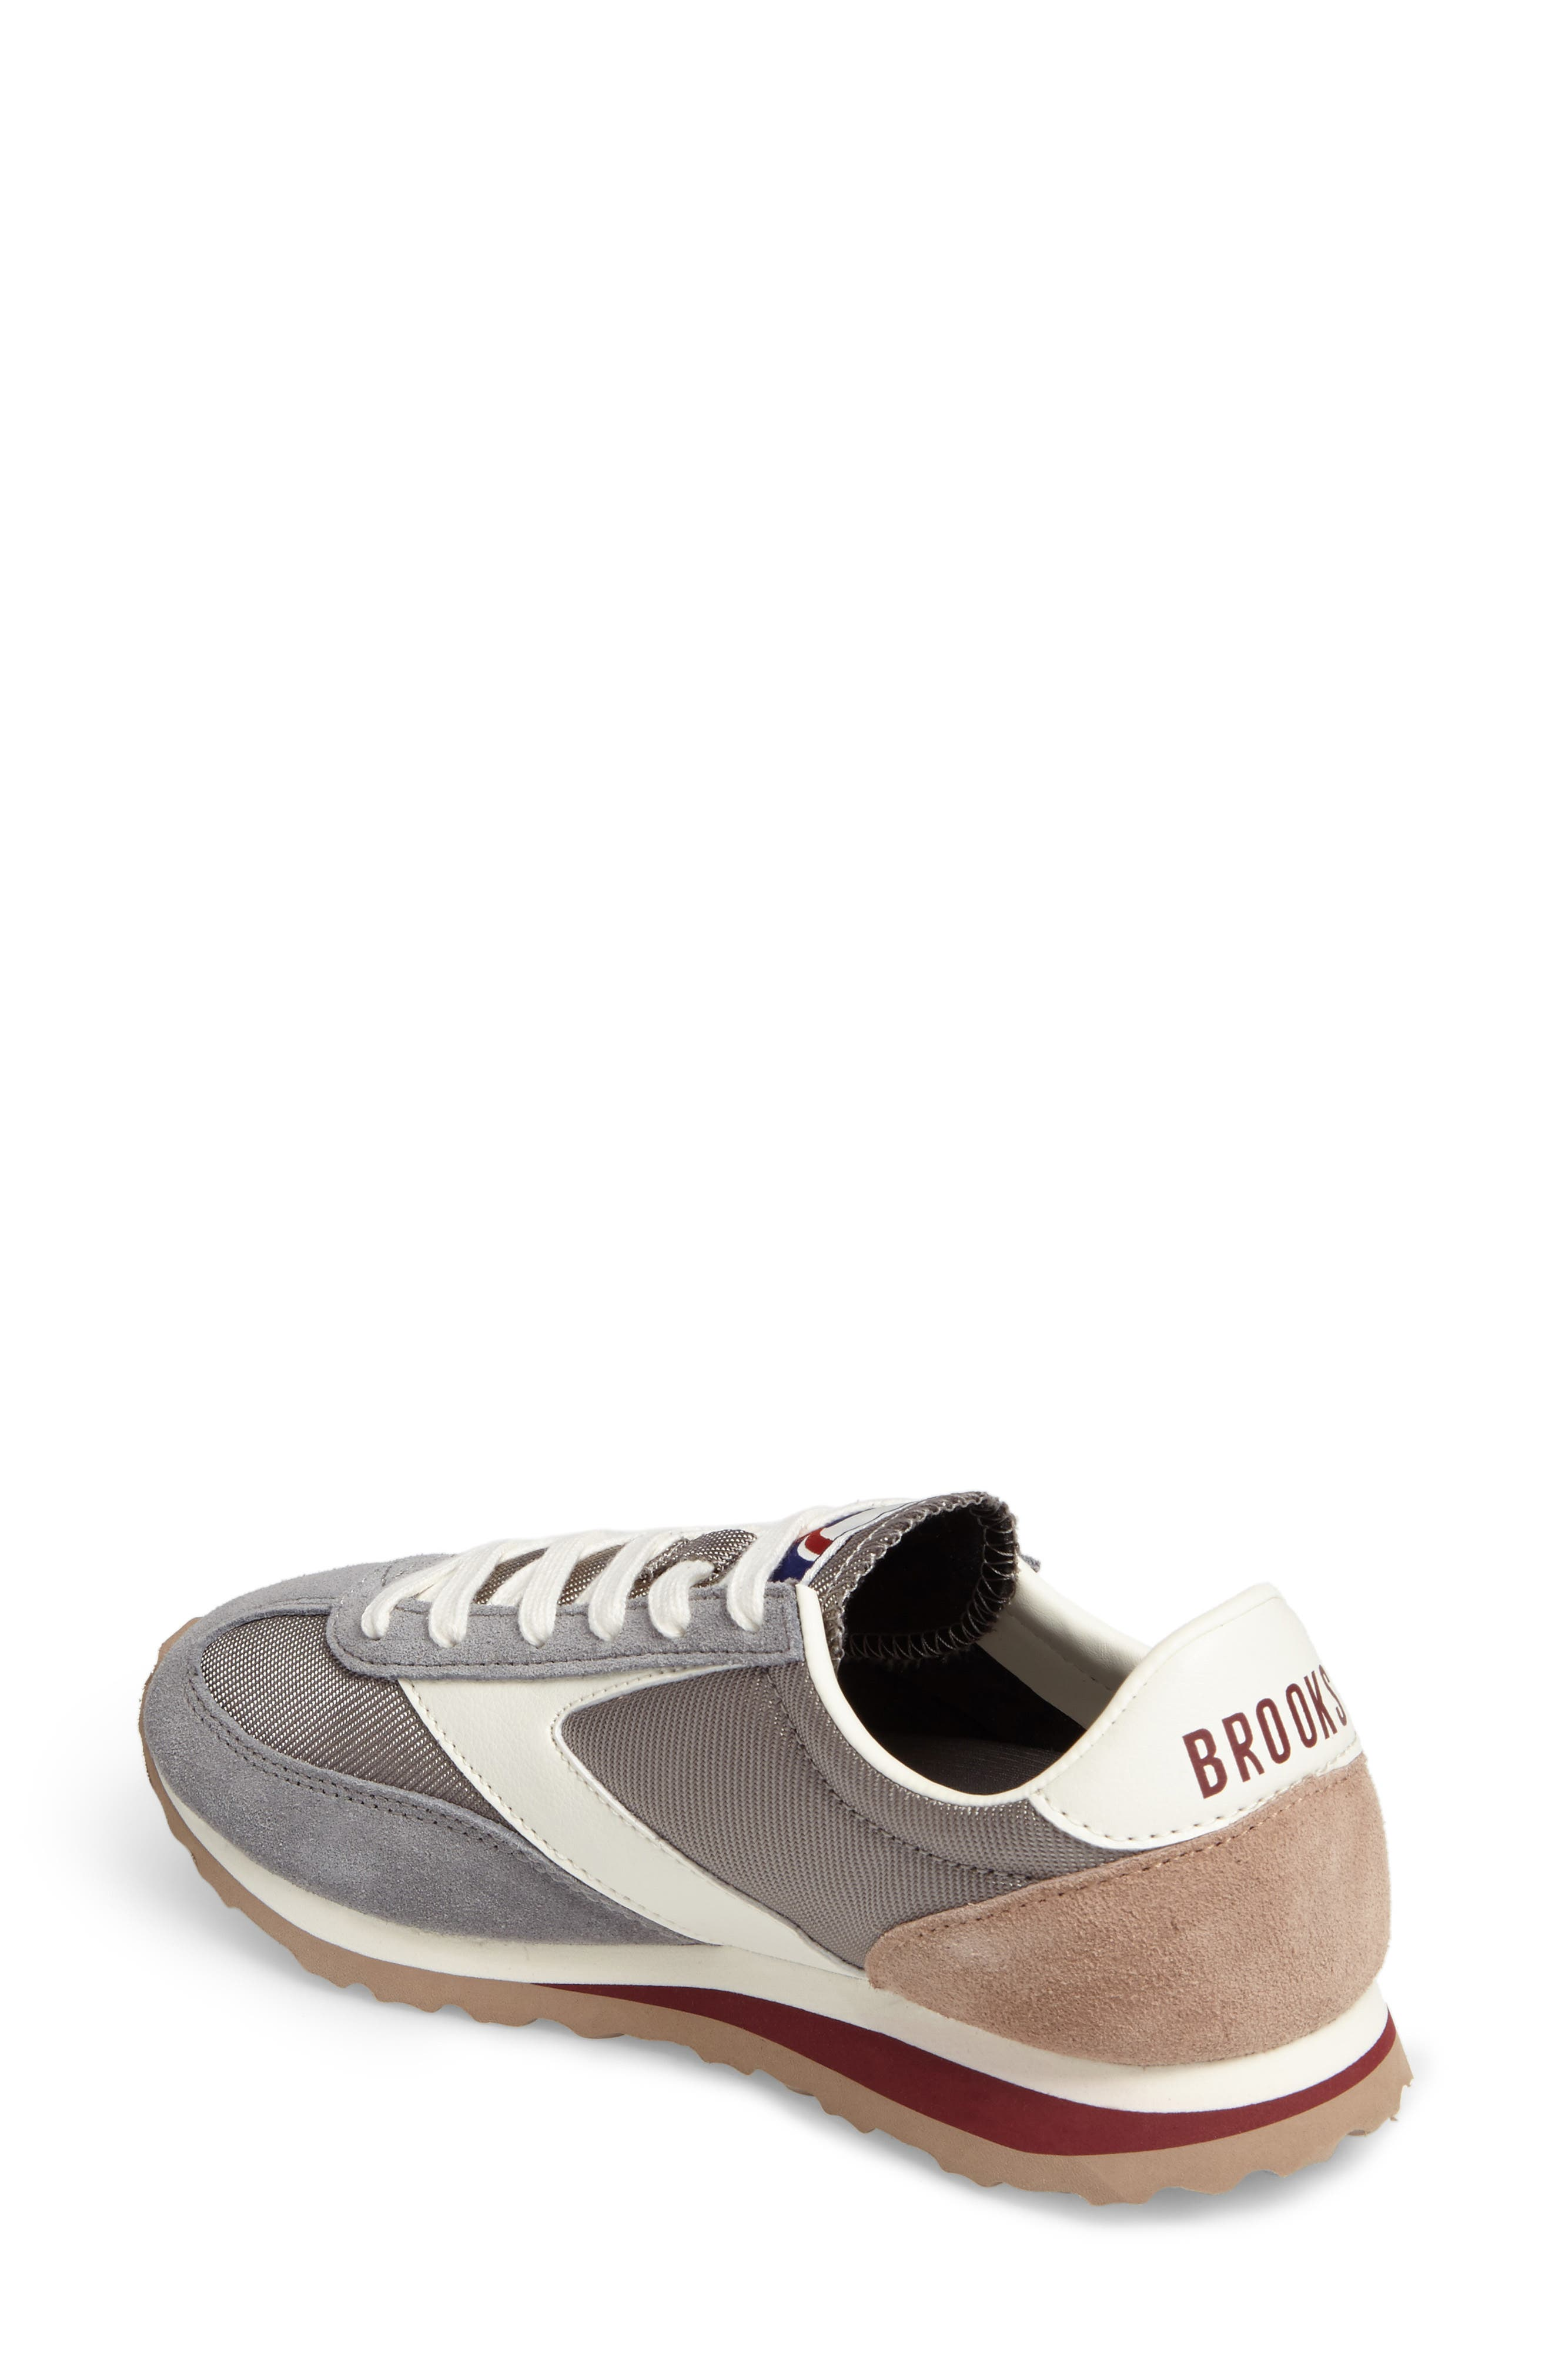 'Vanguard' Sneaker,                             Alternate thumbnail 74, color,